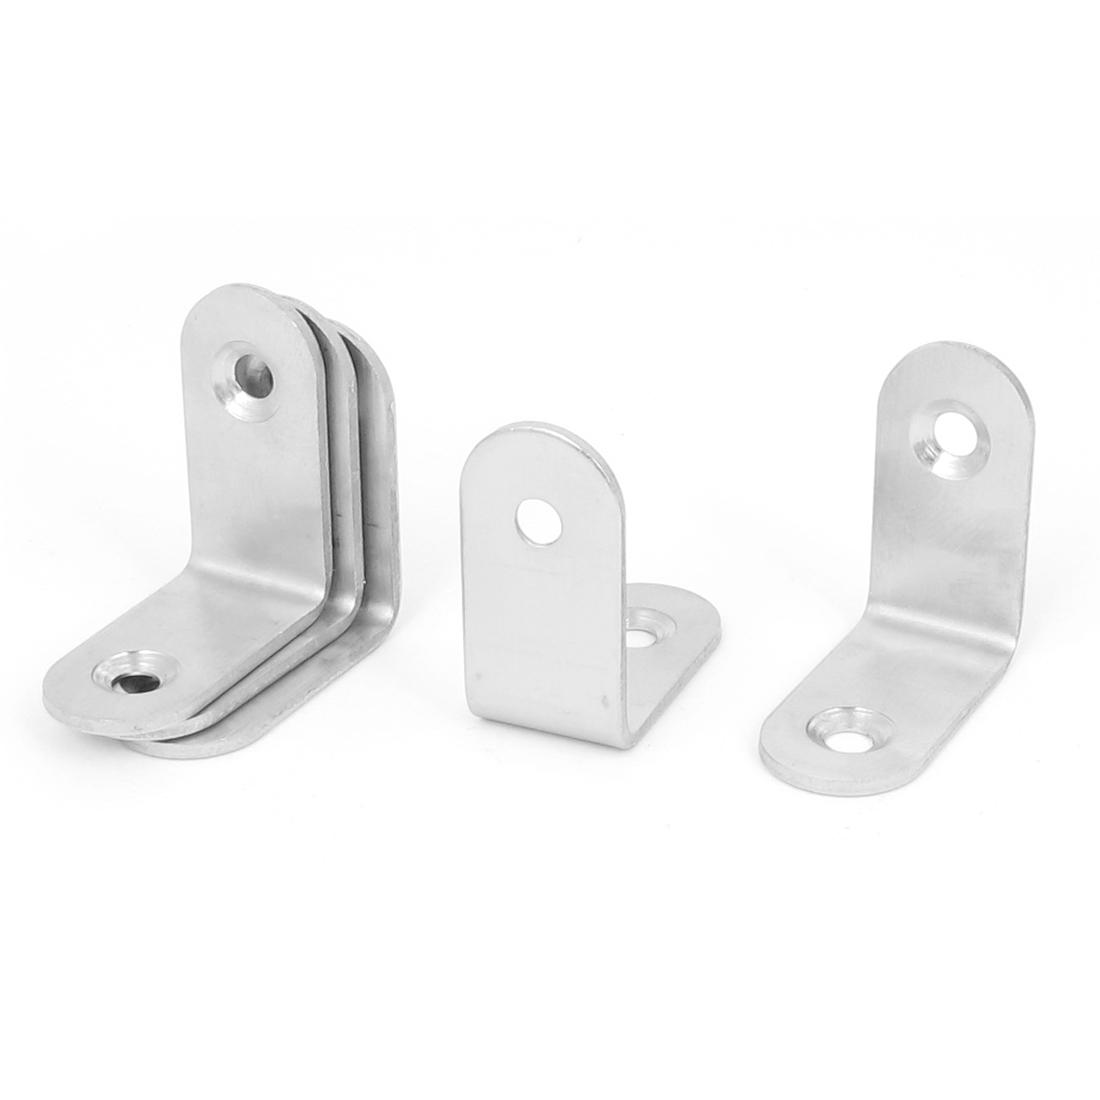 30mmx30mm L Shape 90 Degree Shelf Corner Brace Repair Right Angle Bracket 5pcs